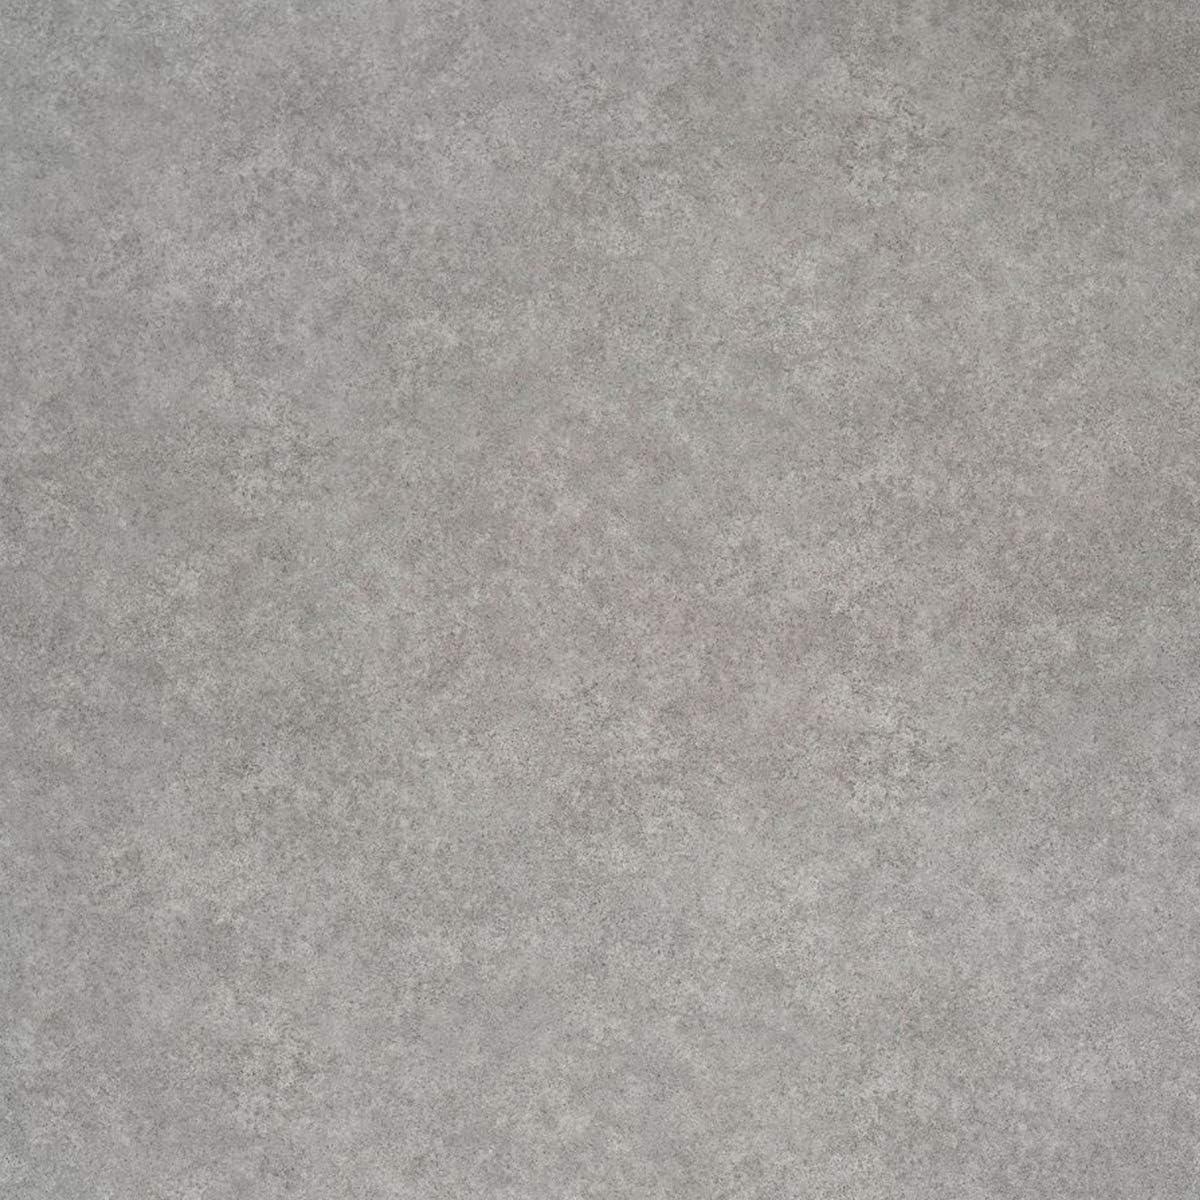 rutschhemmender Fu/ßboden-Belag PVC Platten strapazierf/ähig /& pflegeleicht Vinylboden 2m Breite /& 4m L/änge Fu/ßbodenheizung geeignet robuster PVC-Boden Classic Holzoptik Hell phthalatfrei